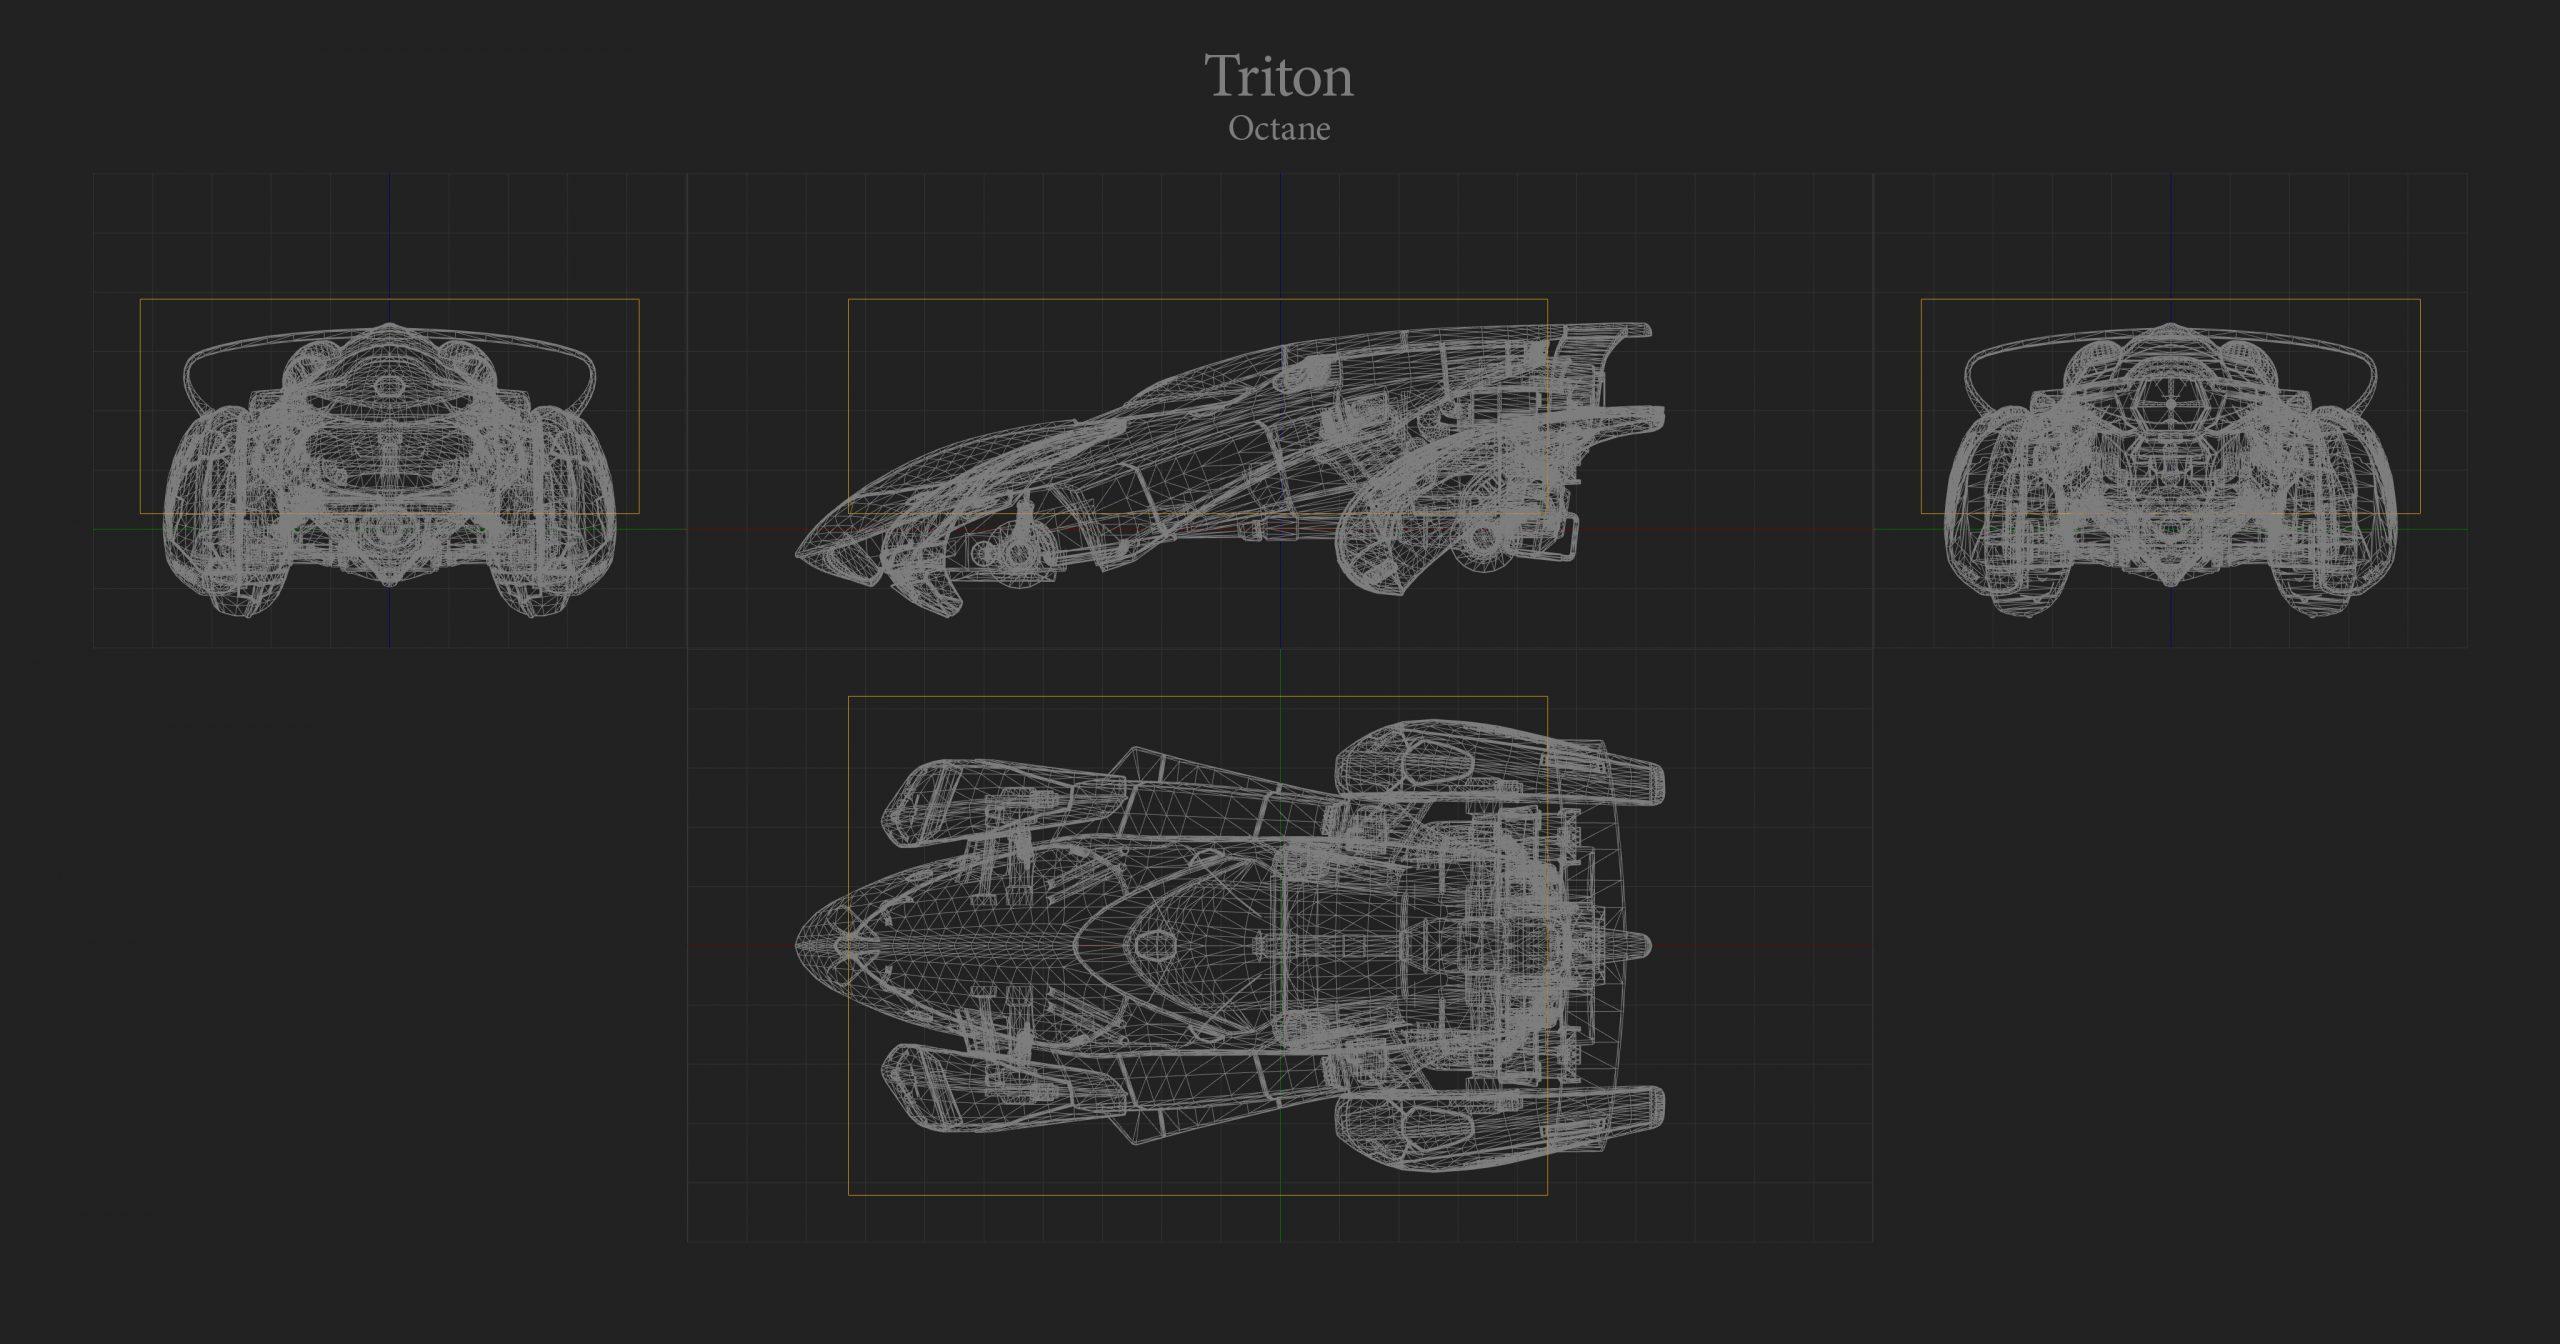 Triton Hitbox Rocket League